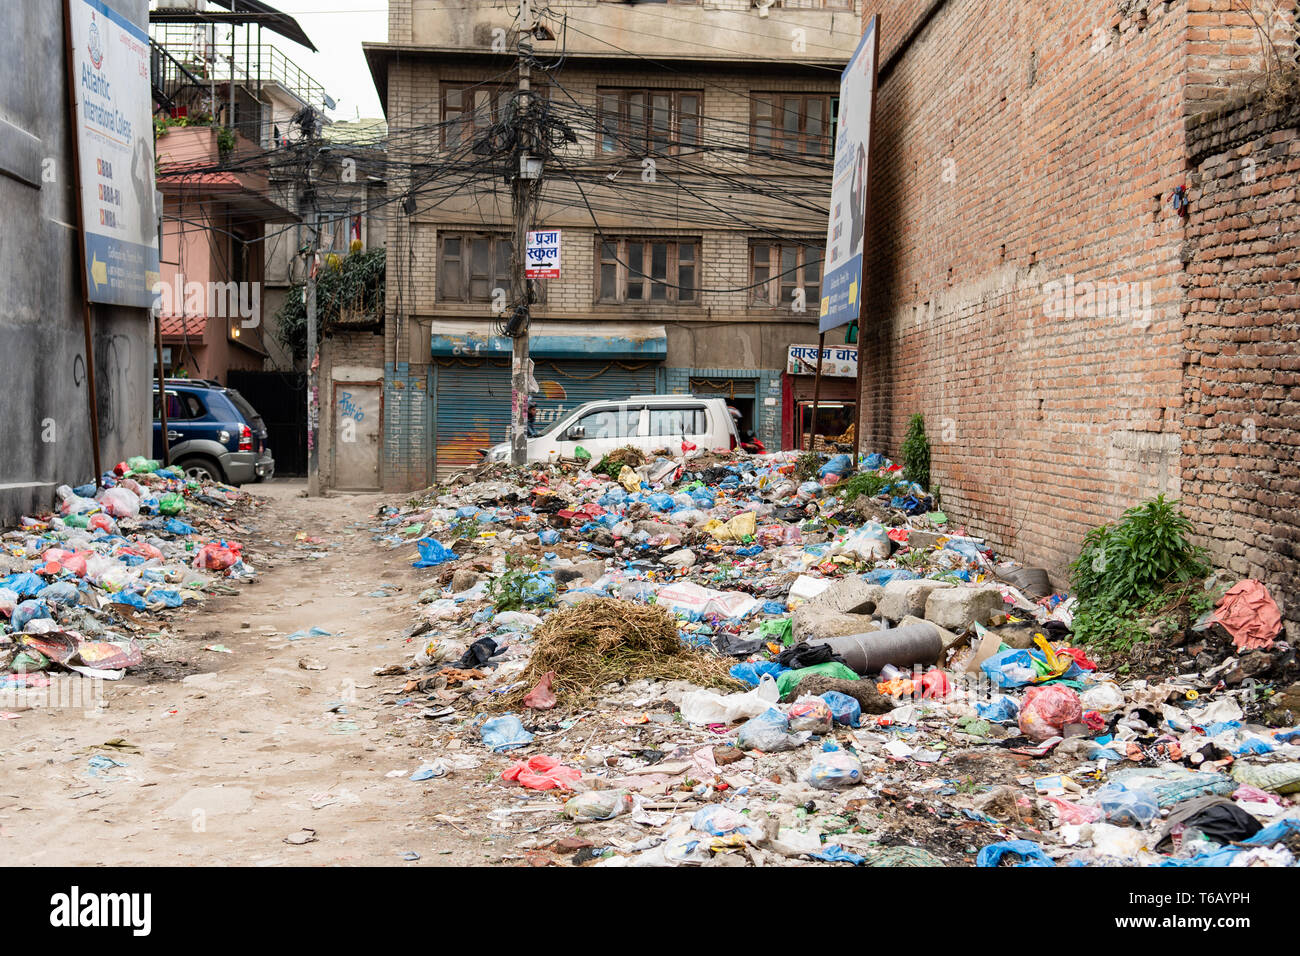 Kathmandu, Nepal - April 20th, 2019 - Garbage mountain in the street near local houses. - Stock Image